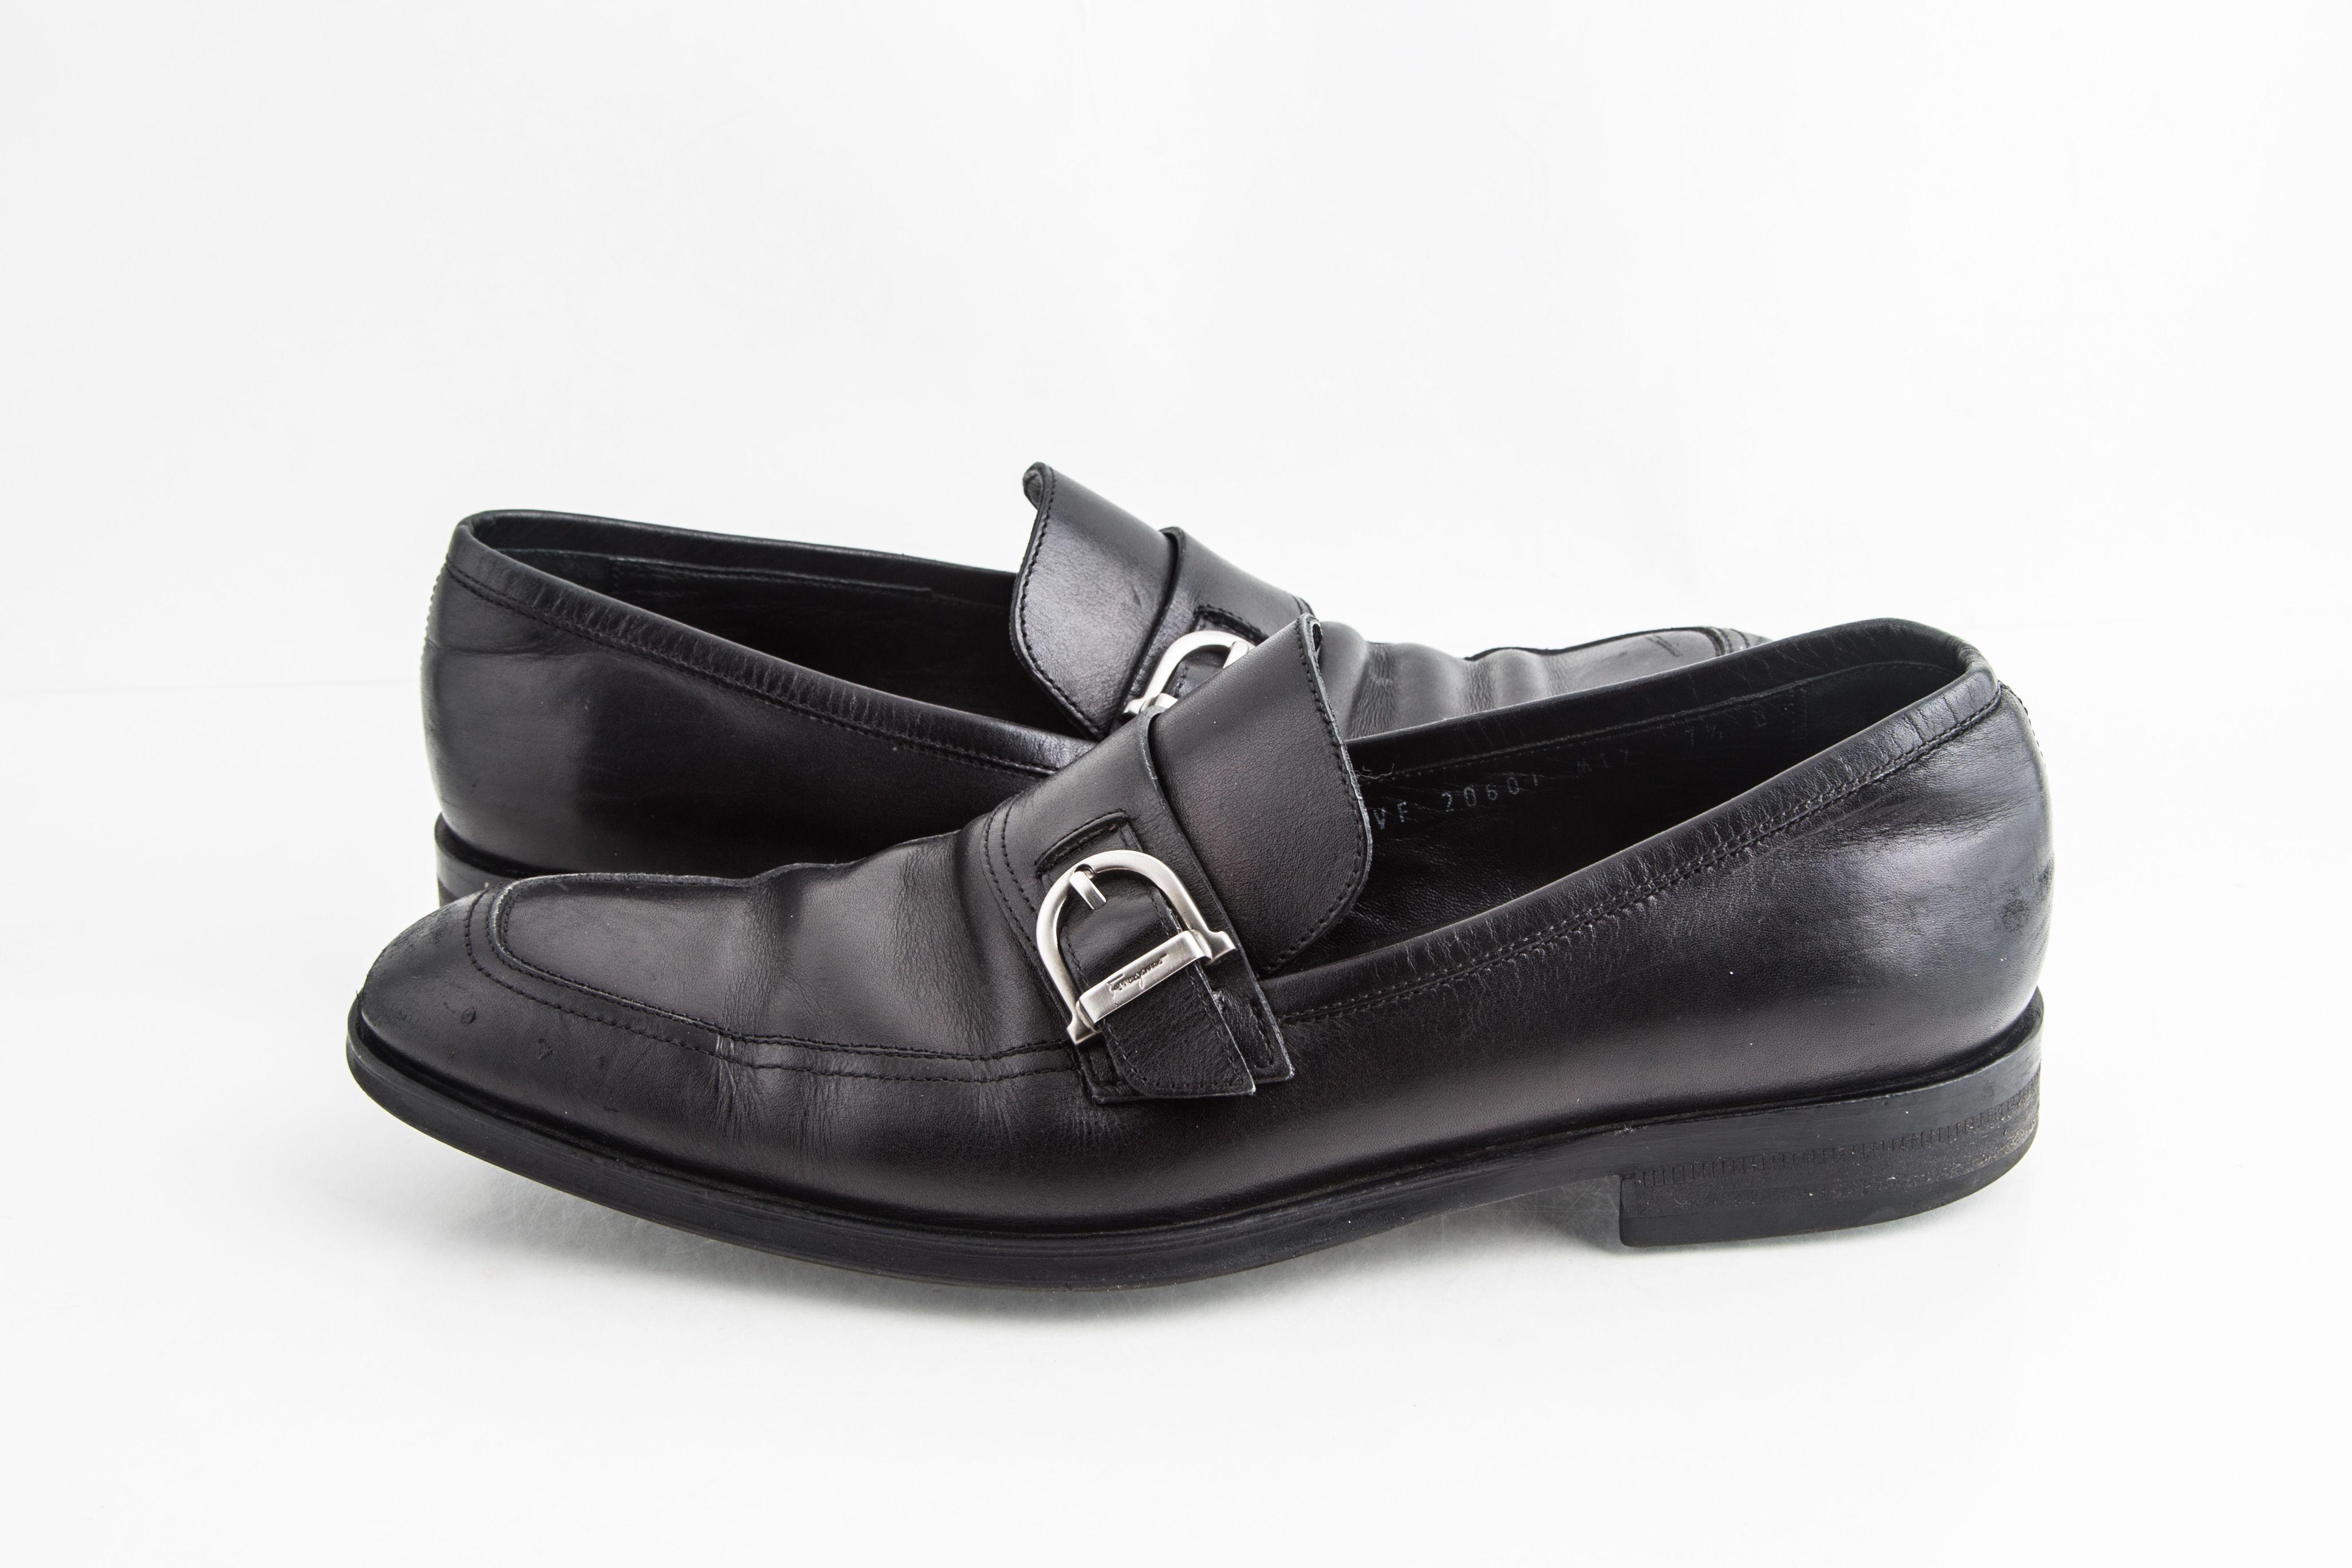 Salvatore Ferragamo Black Leather